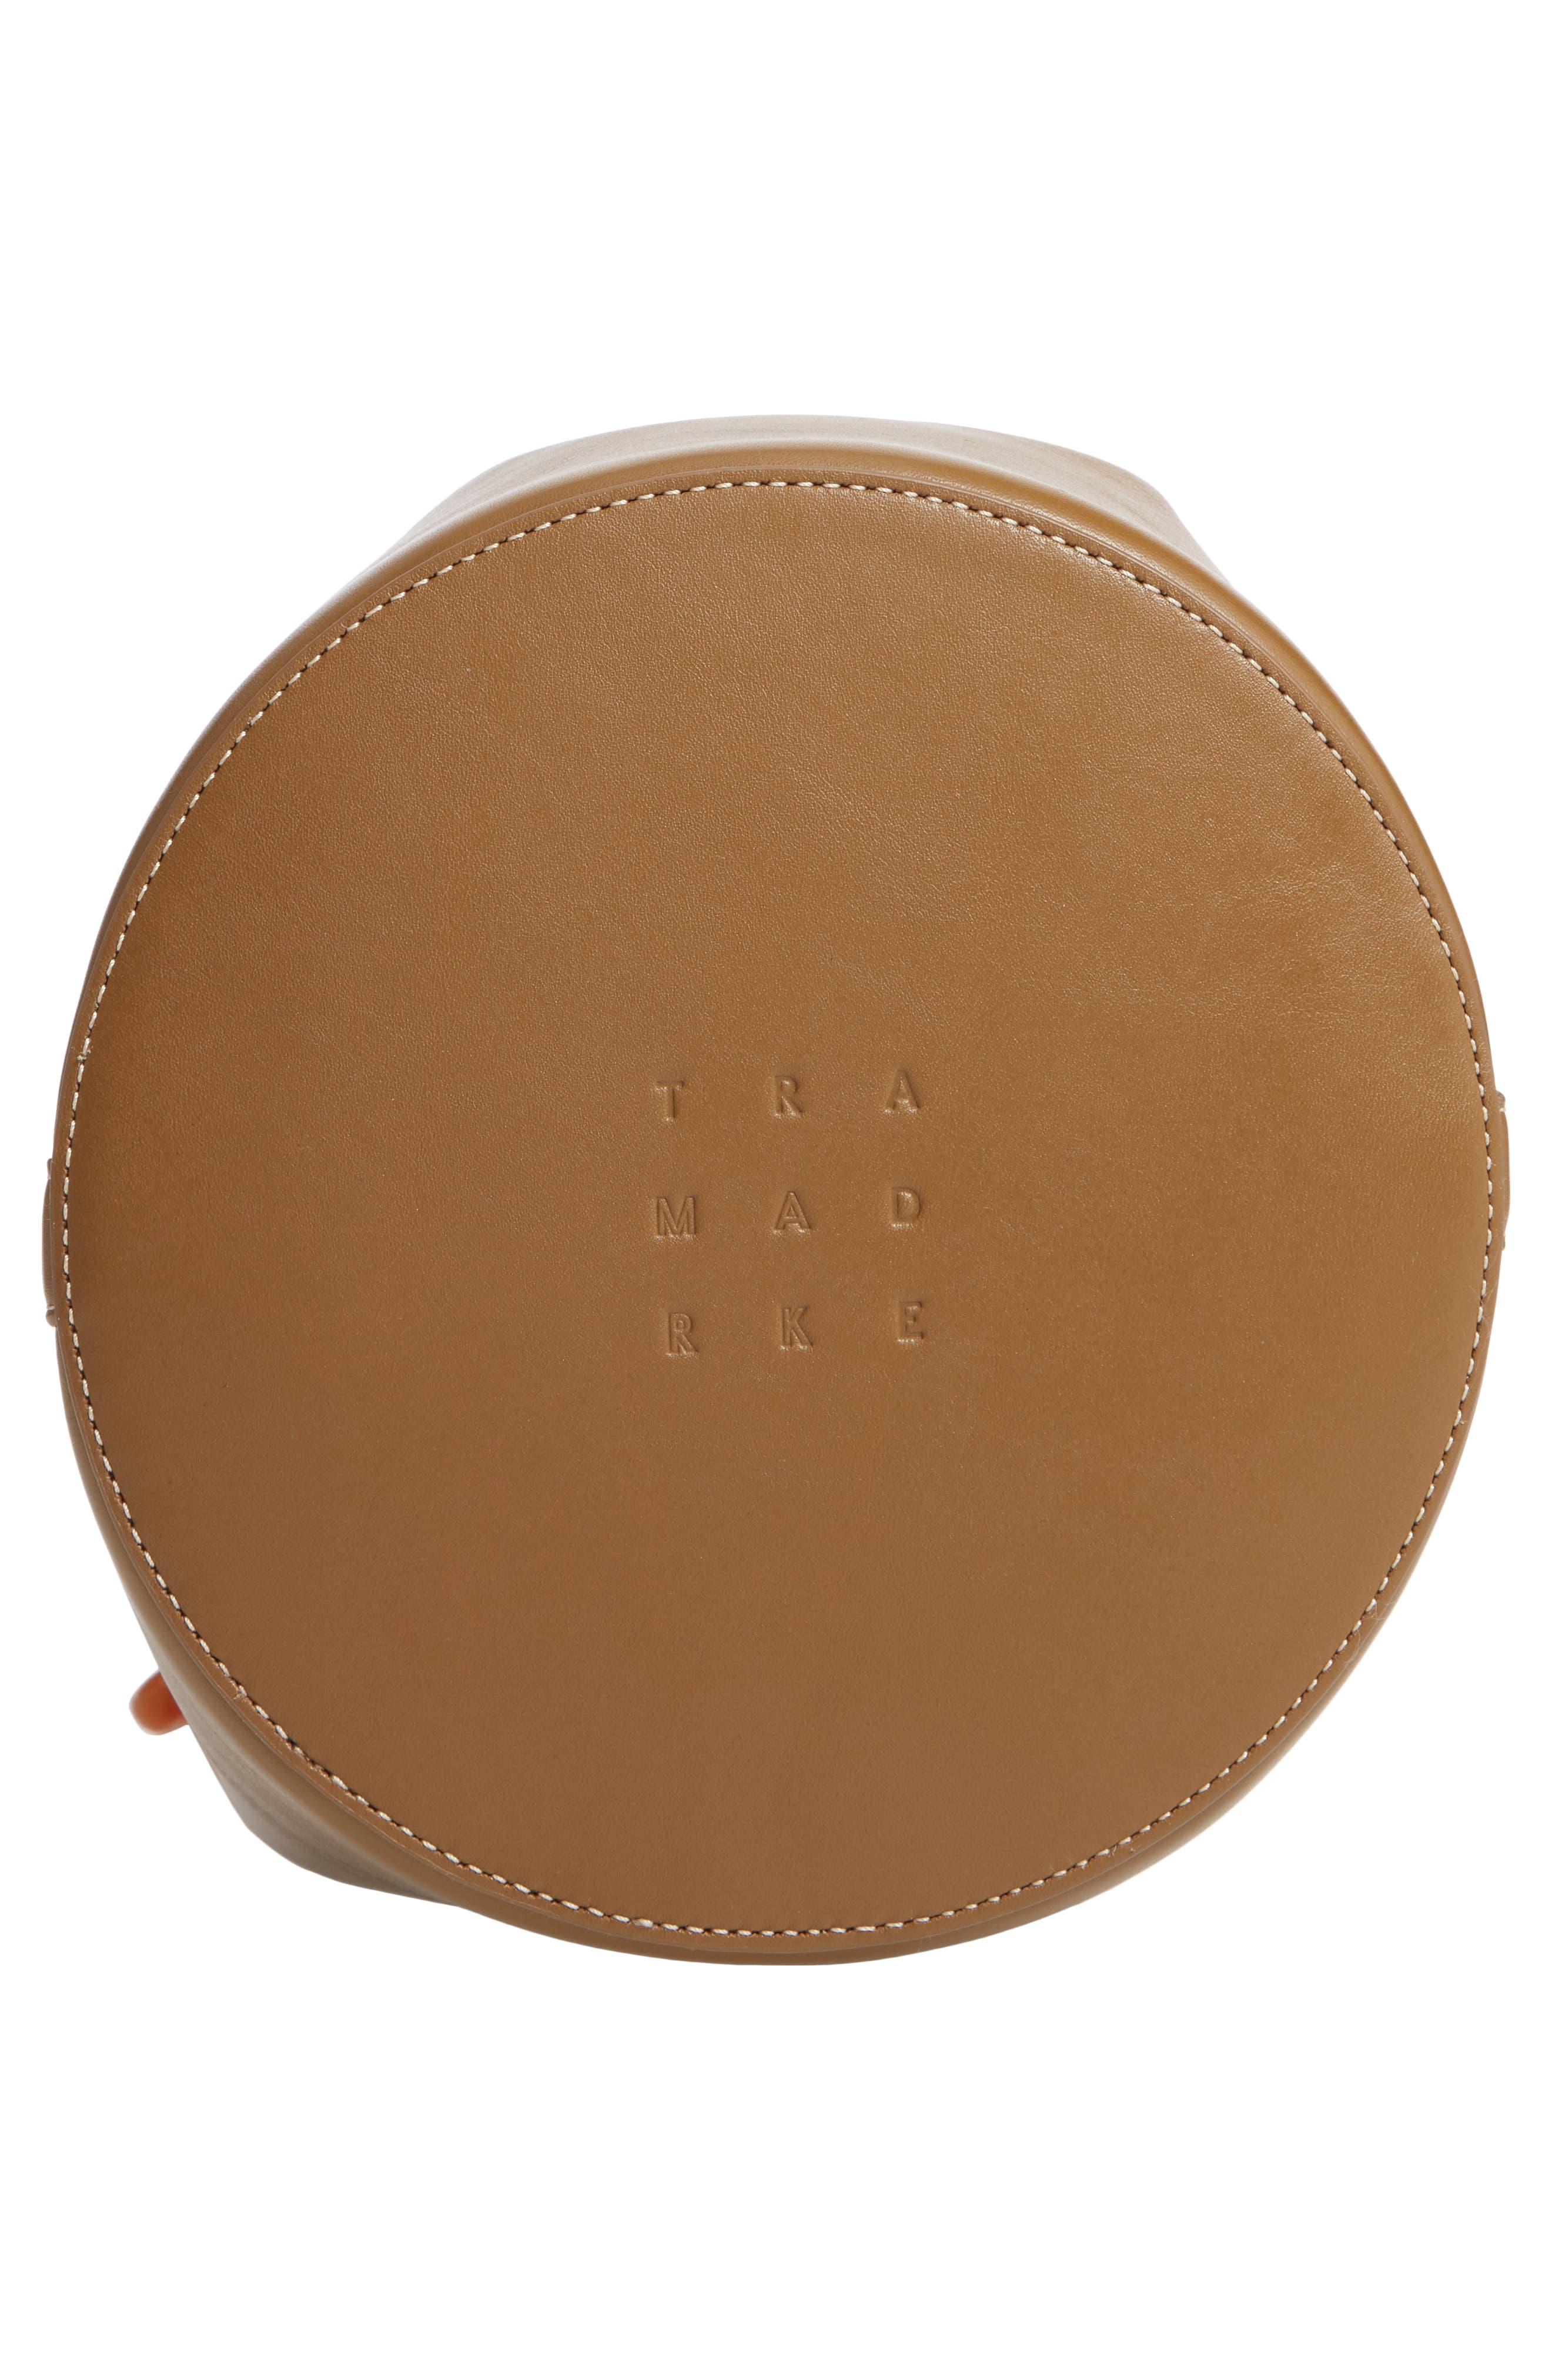 Goodall Leather Bucket Bag,                             Alternate thumbnail 6, color,                             200